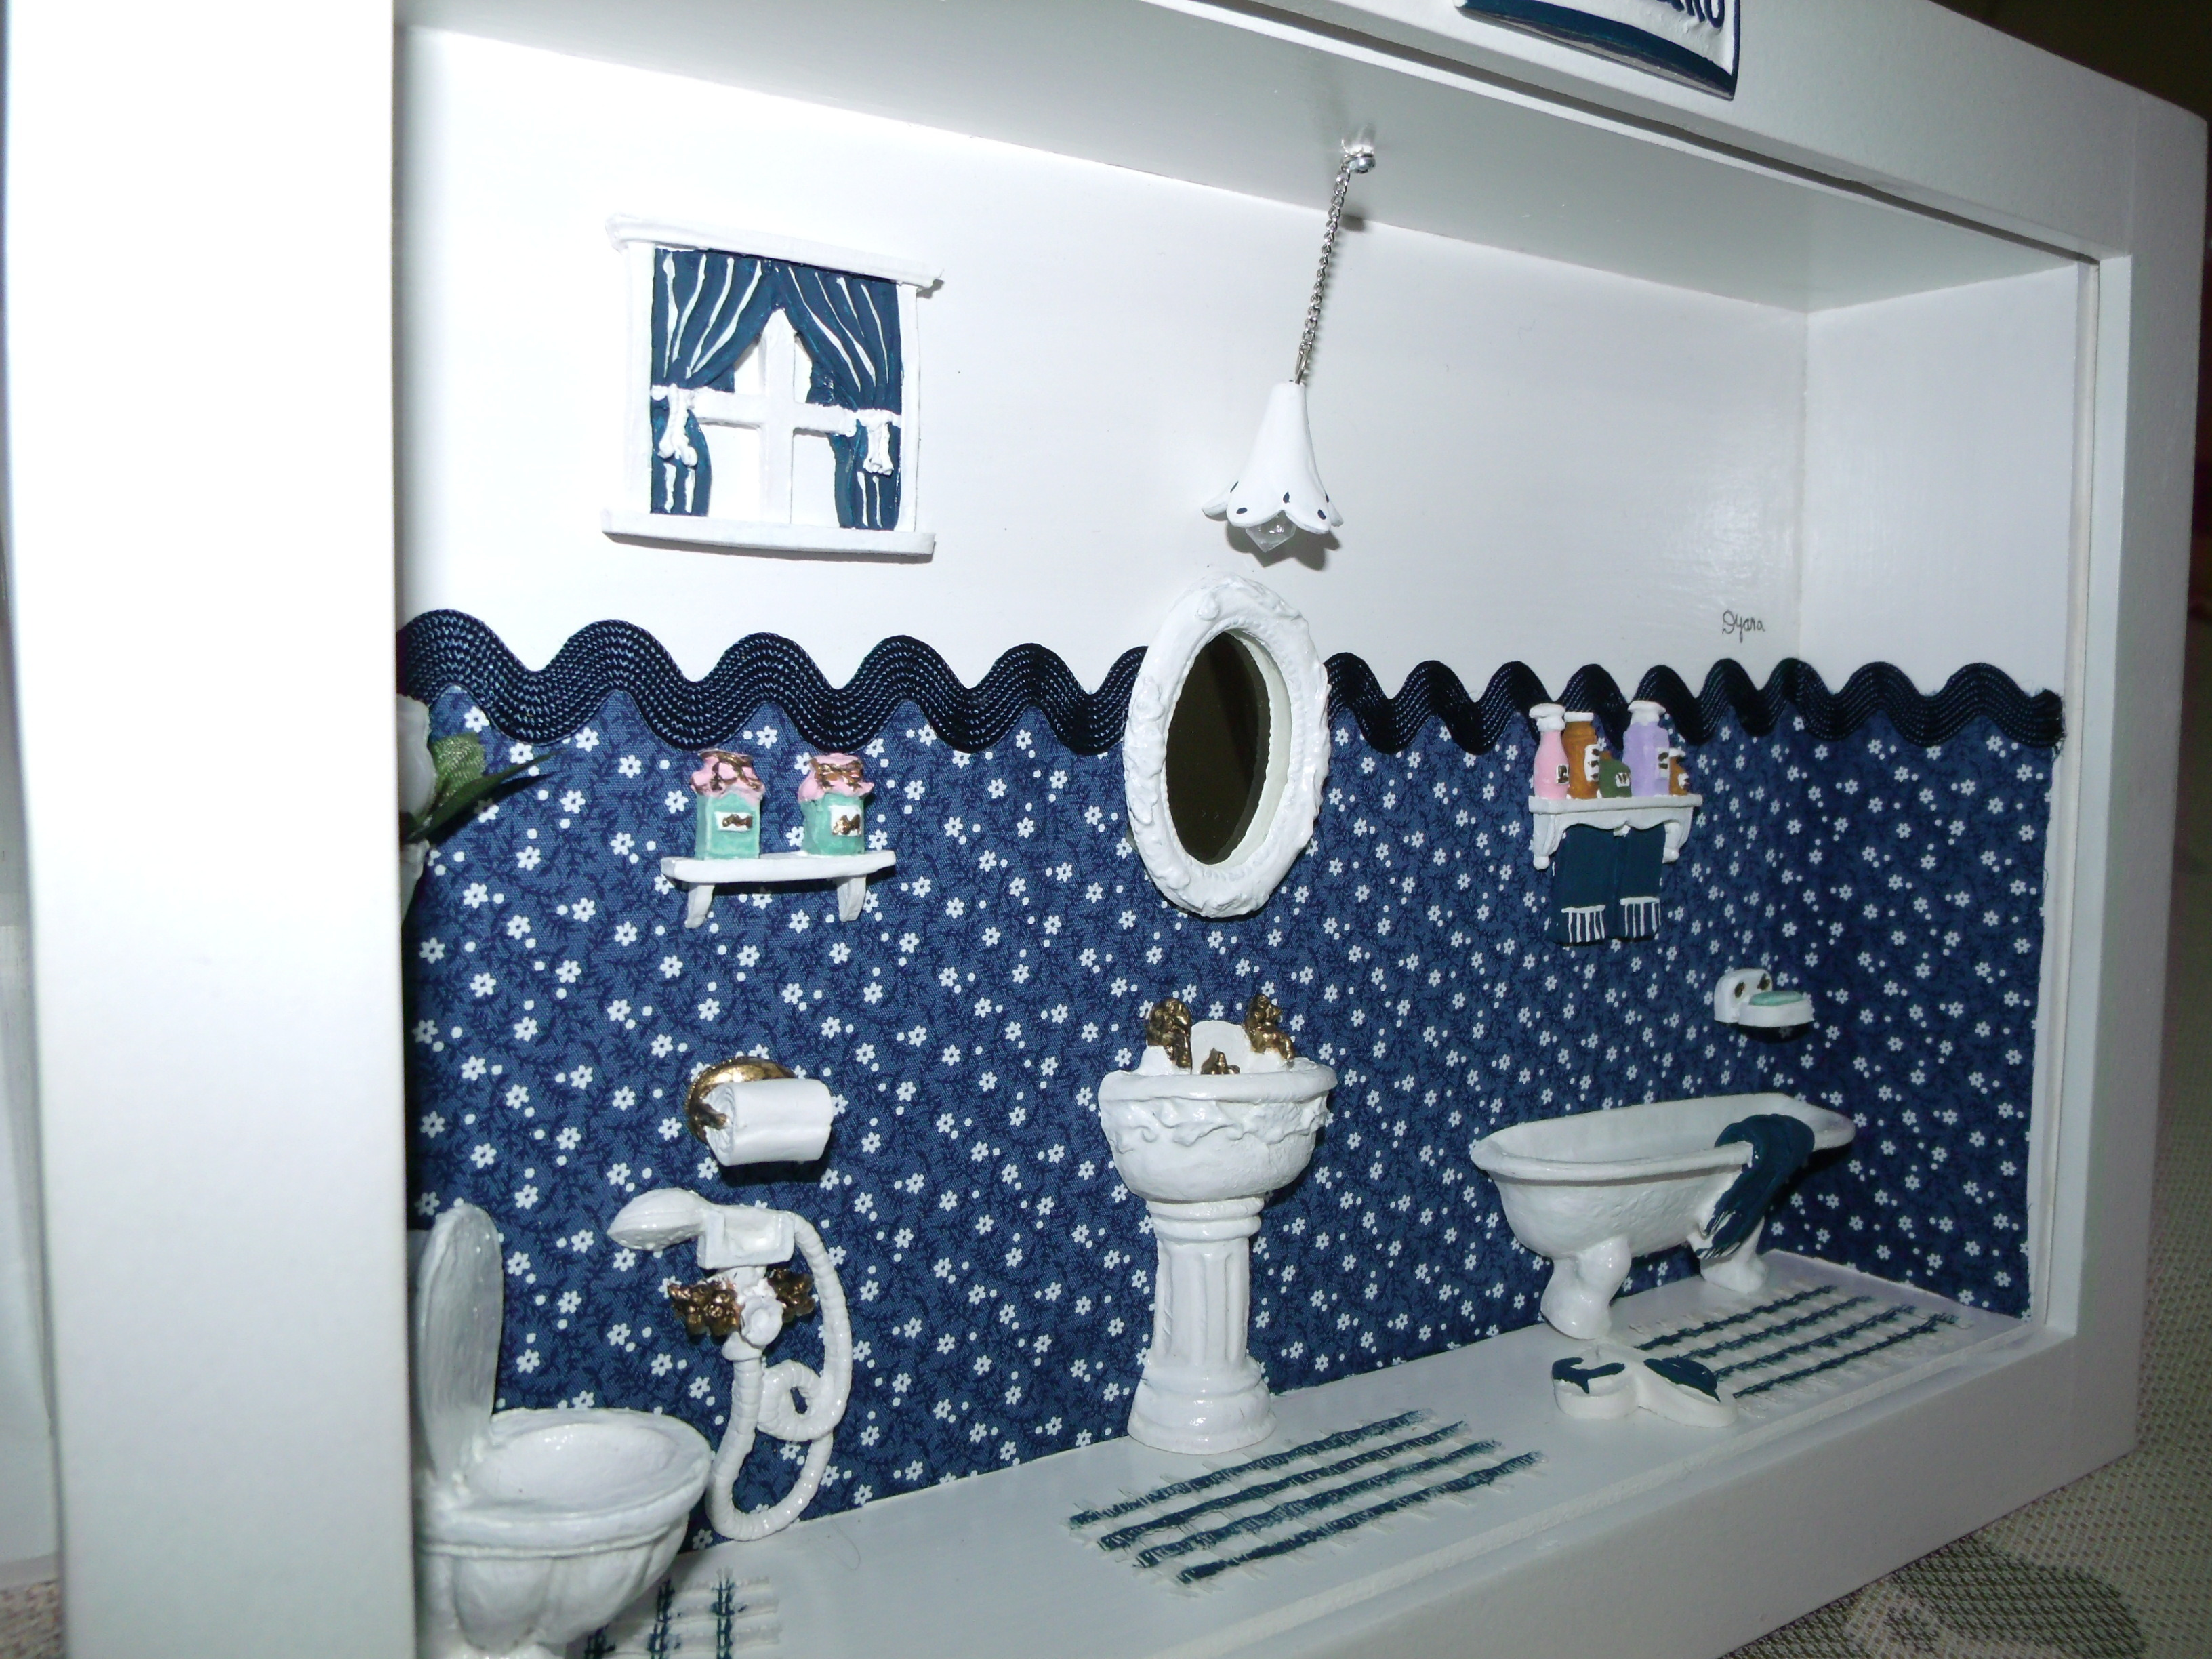 azul marinho Banheiro azul marinho Banheiro azul marinho Banheiro azul  #2A4267 3264x2448 Banheiro Com Azul